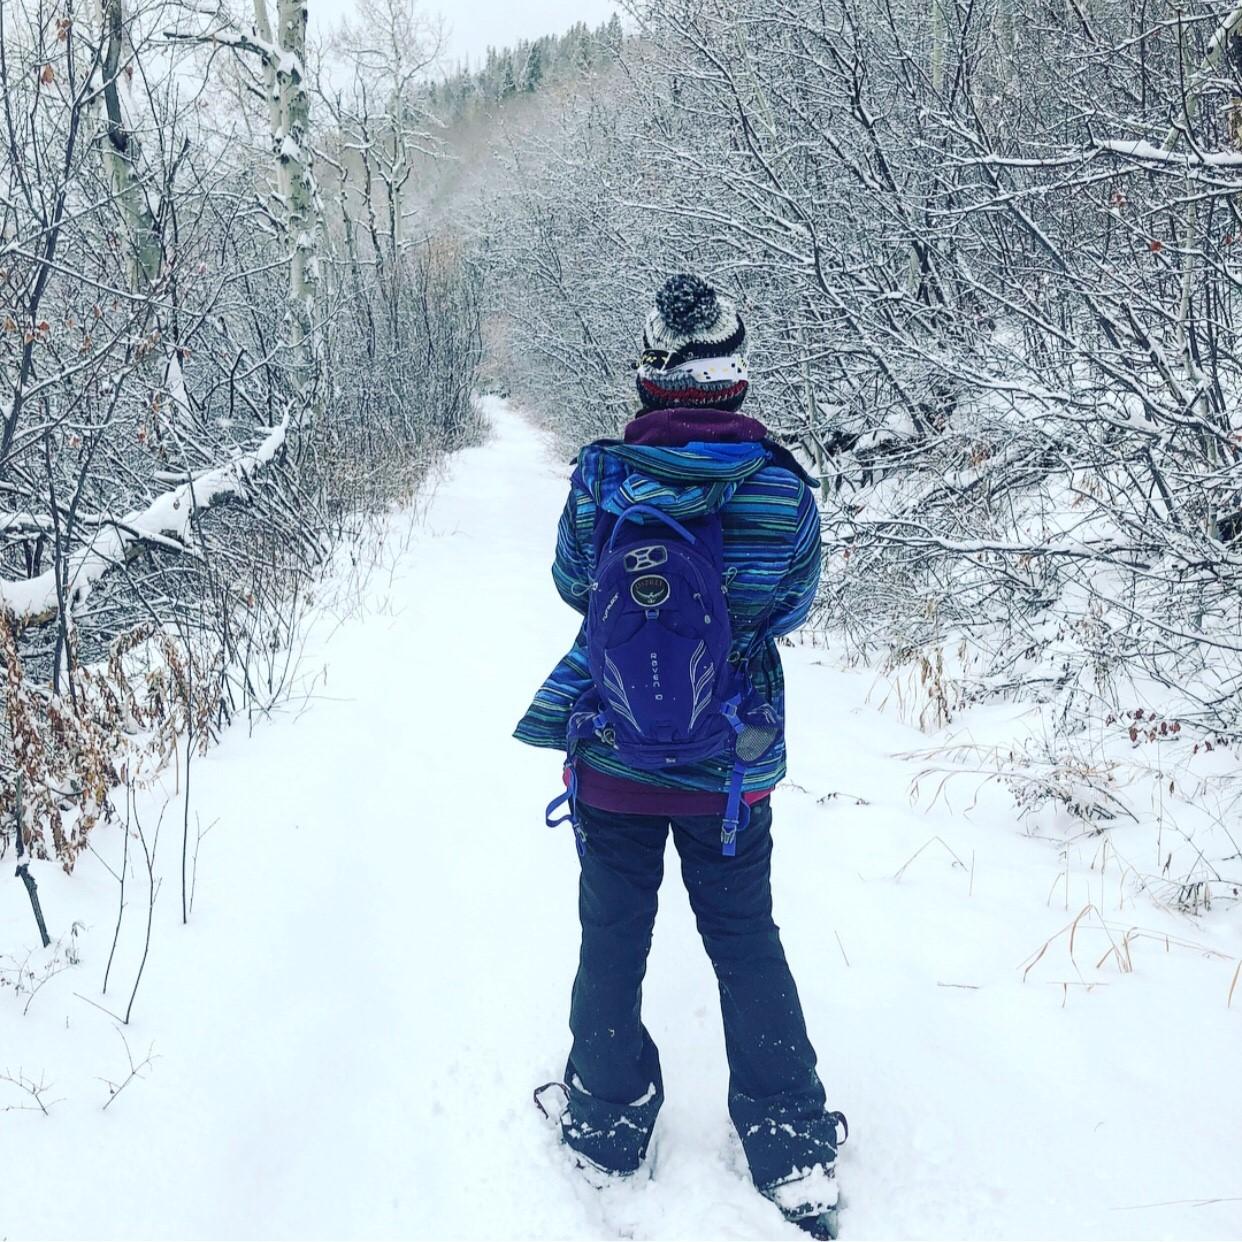 Faithful steps by Alexandra Samit, December 2017